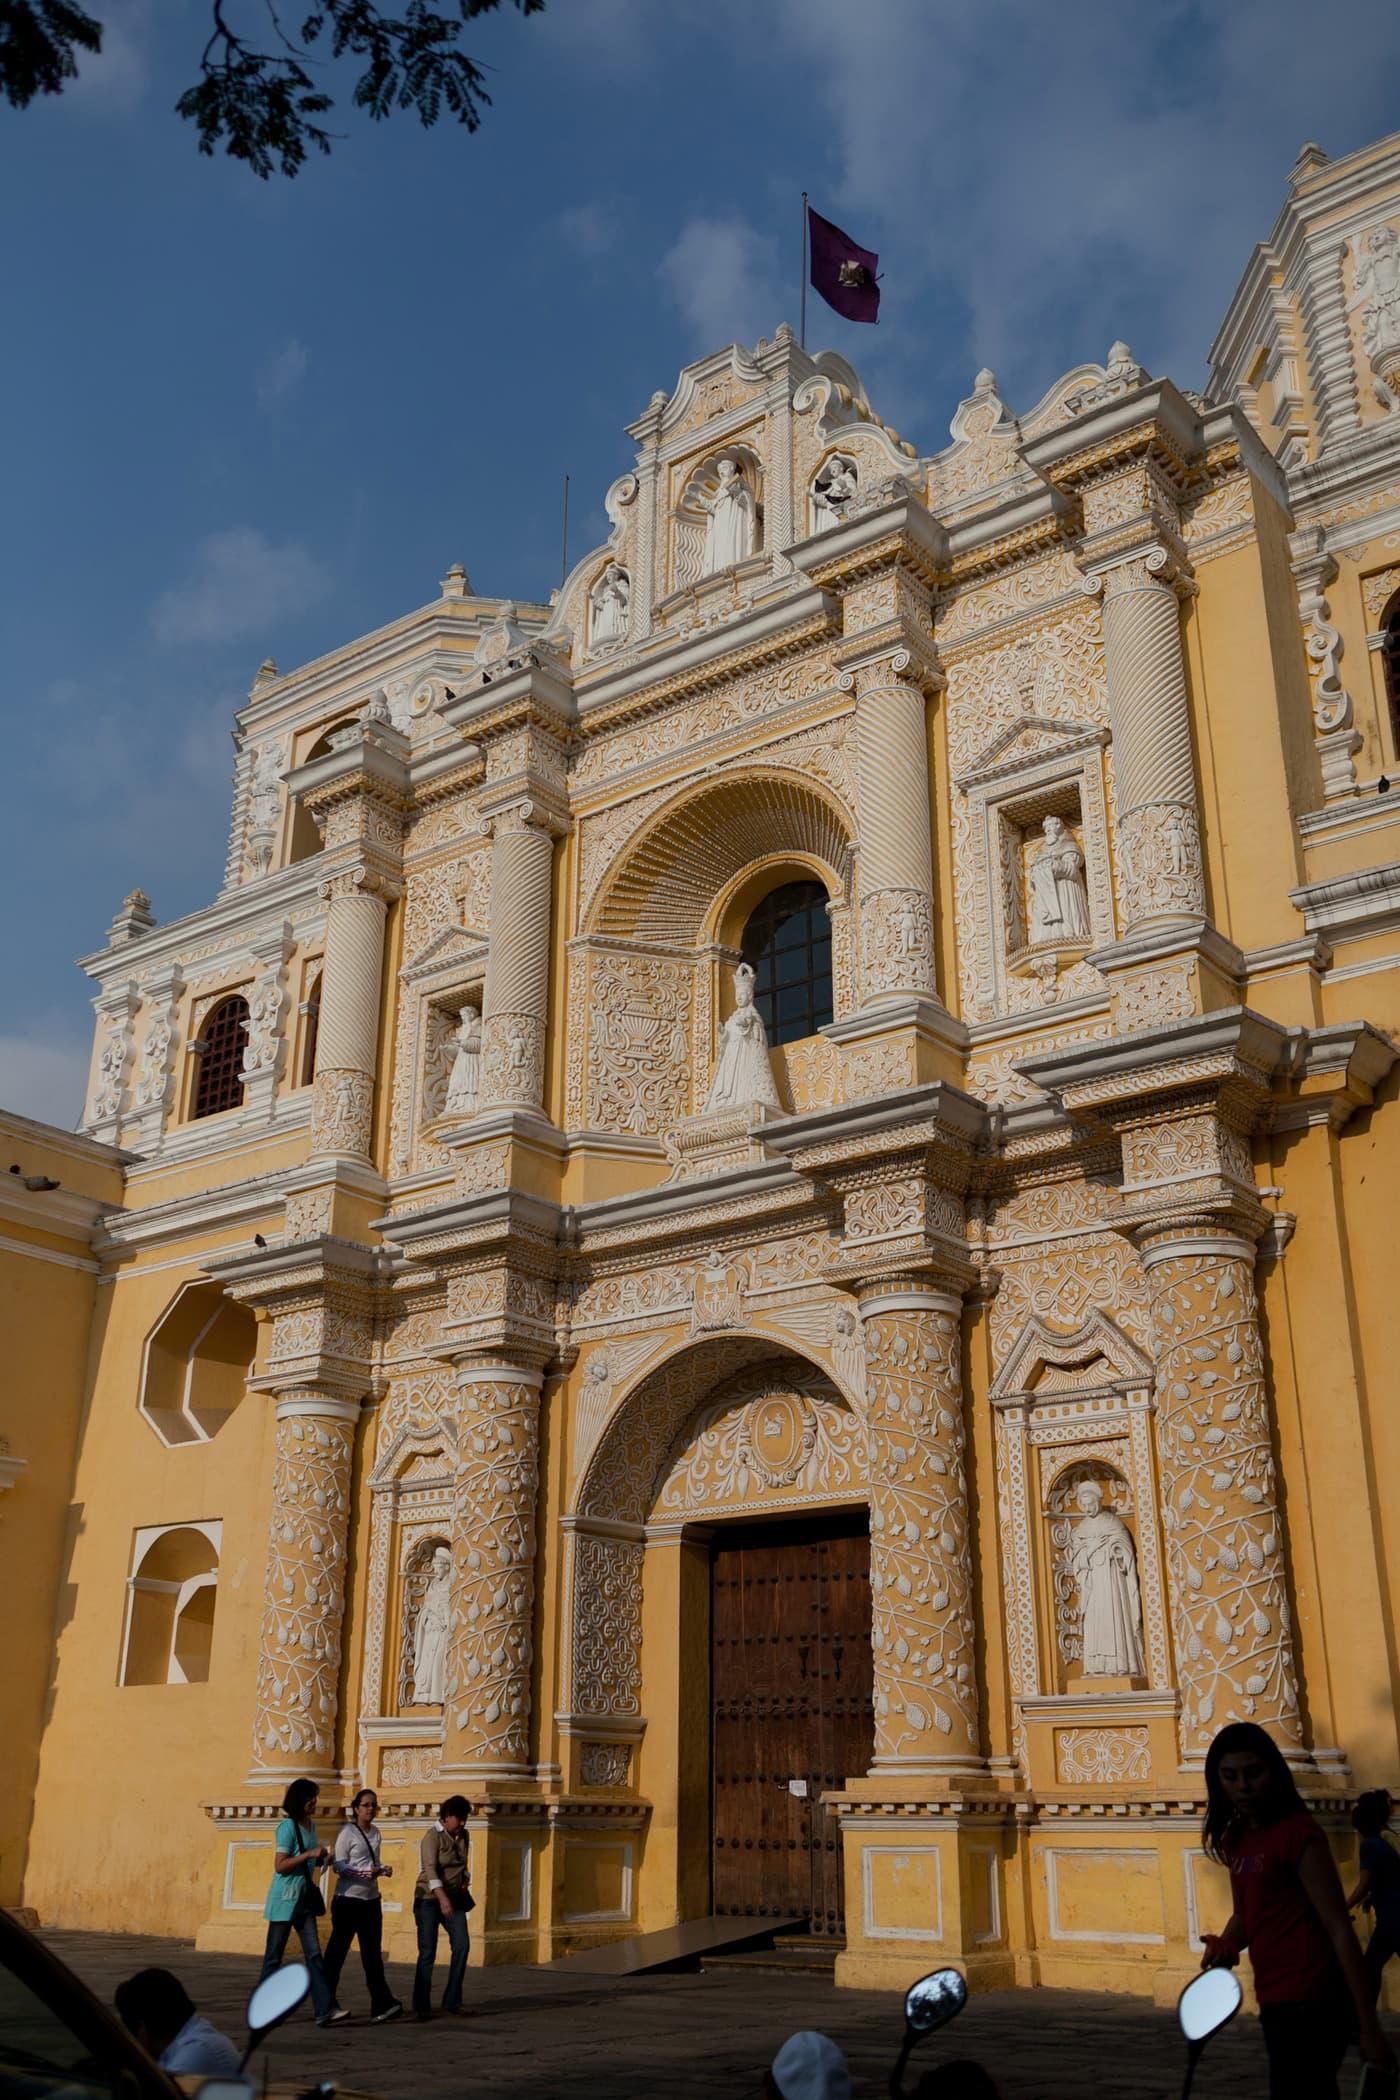 Iglesia de Nuestra Sentar de la Merced in Antigua, Guatemala.